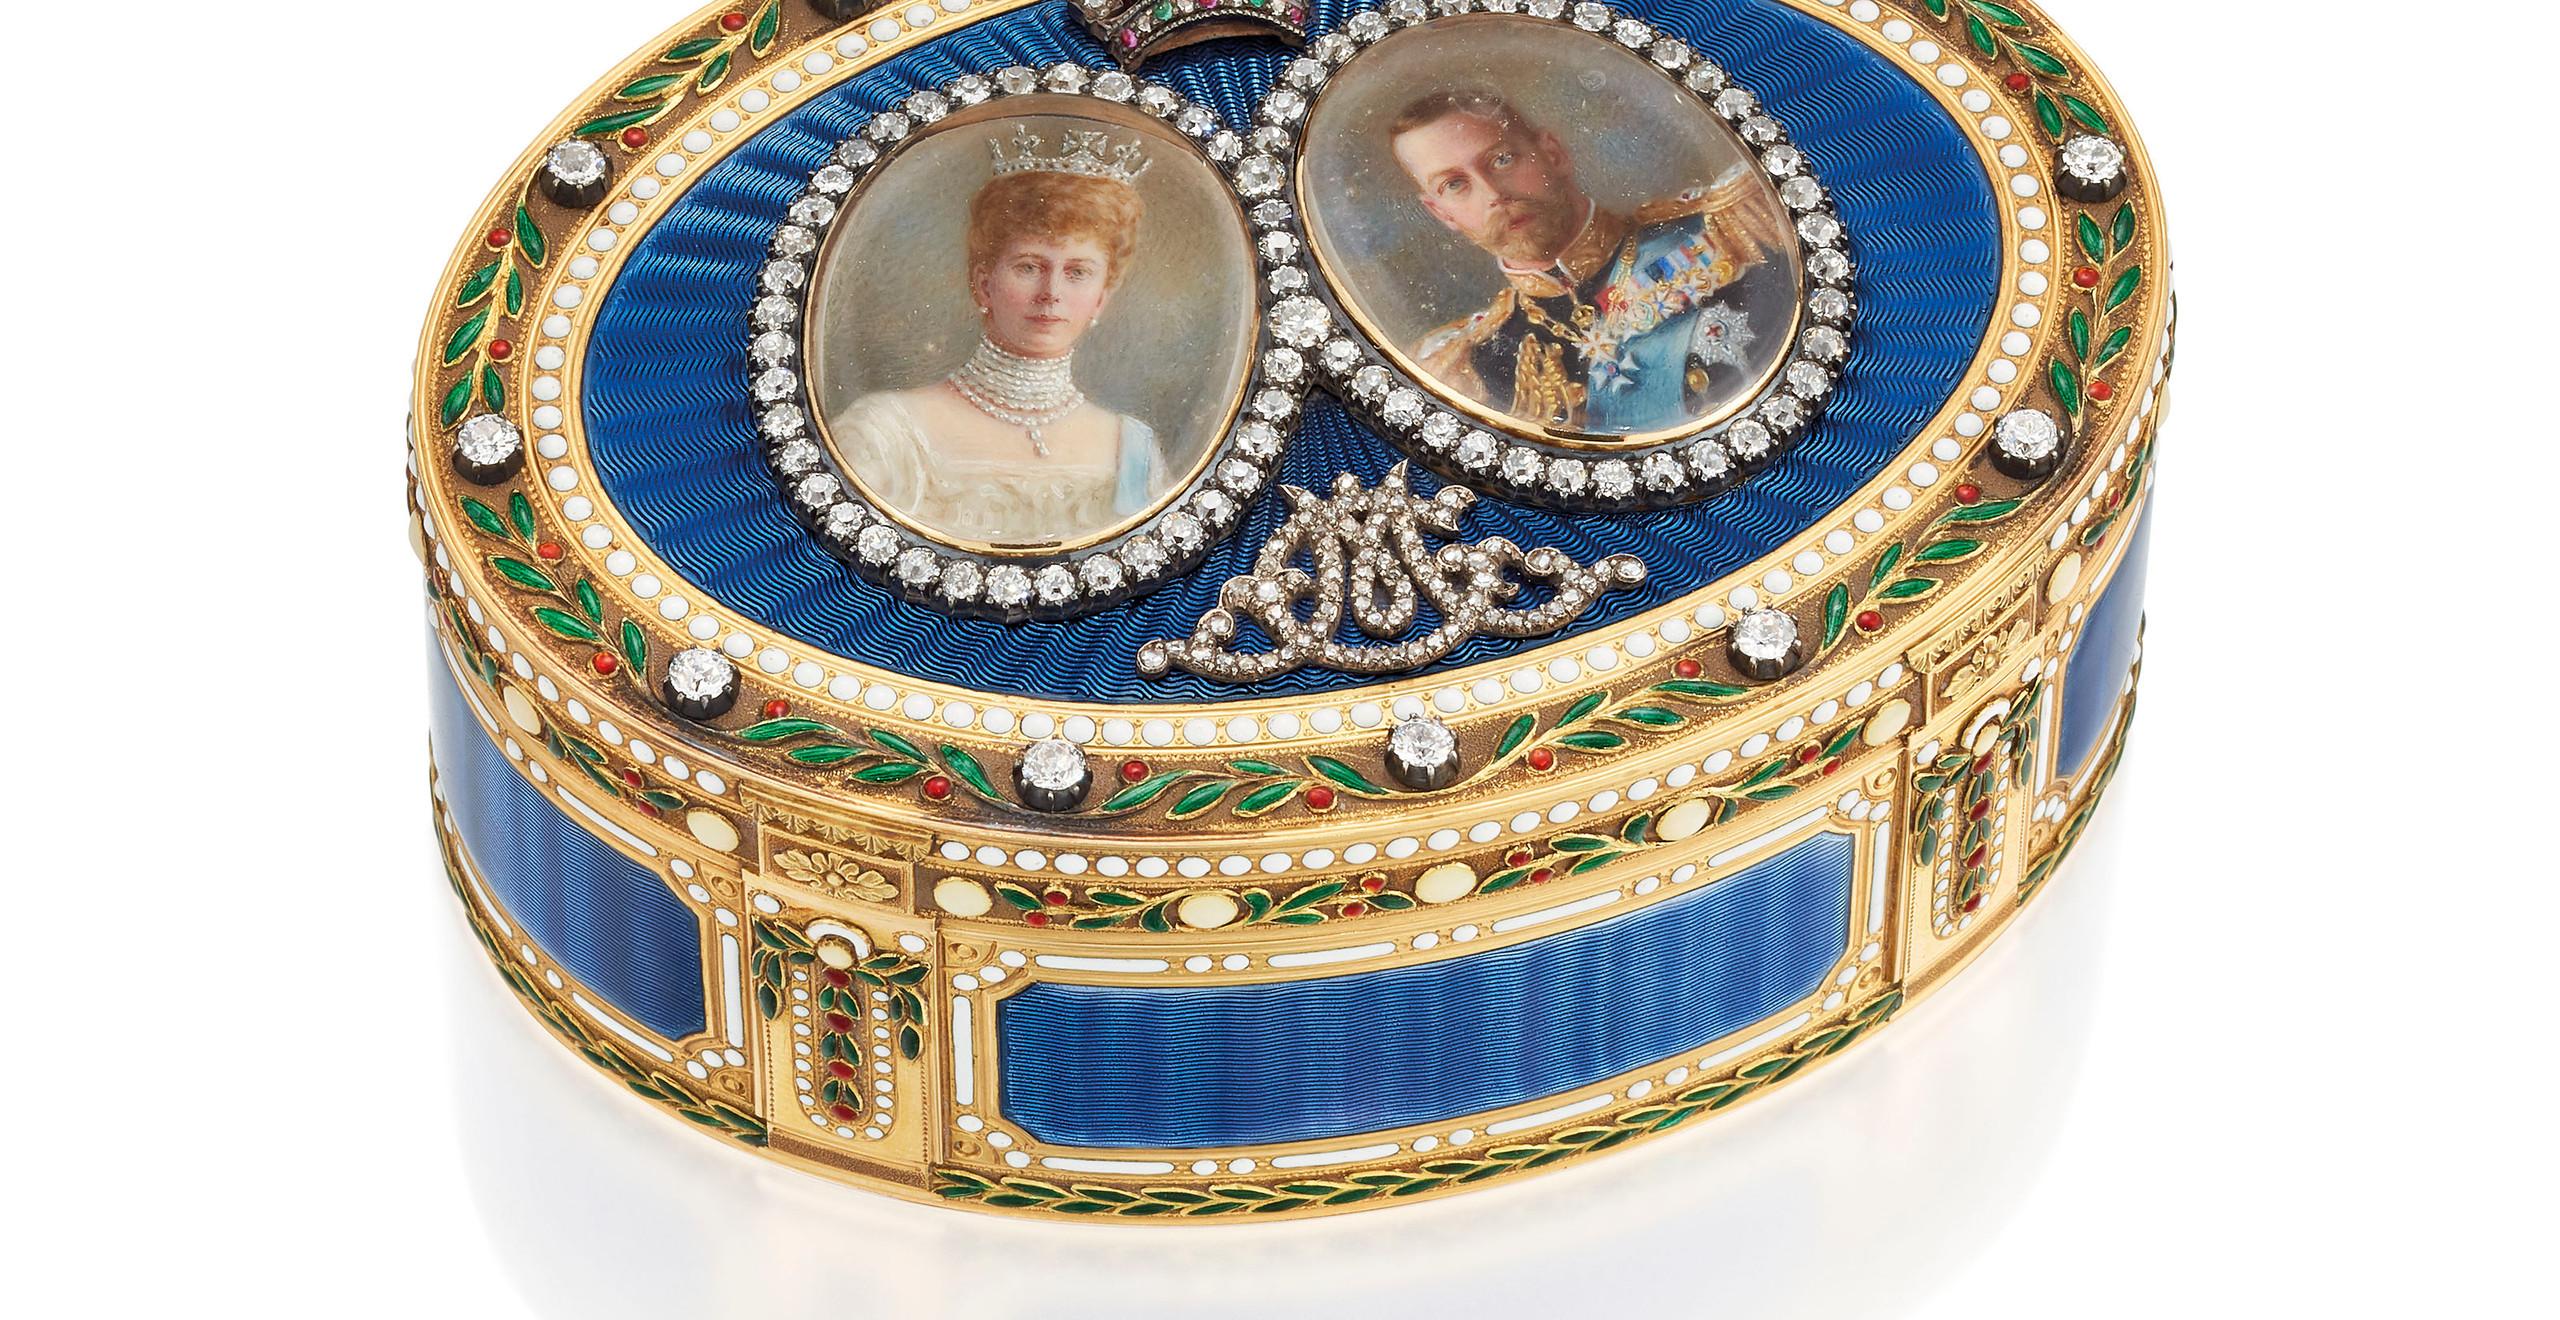 A GEORGE V JEWELLED ENAMELLED GOLD ROYAL PRESENTATION SNUFF-BOX  - mark of sebastian Garrard, London 1911